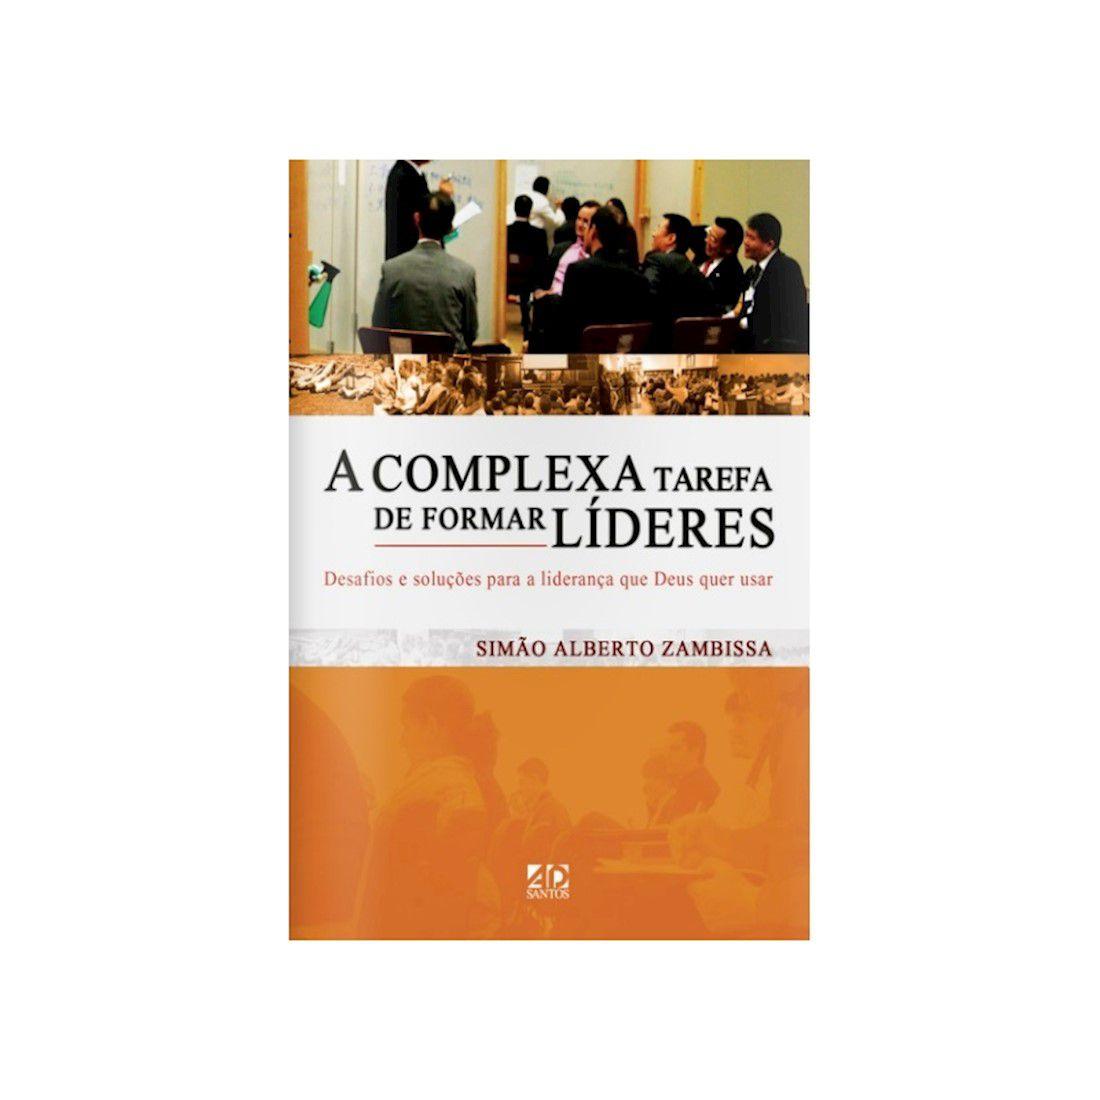 Livro A Complexa Tarefa de Formar Líderes